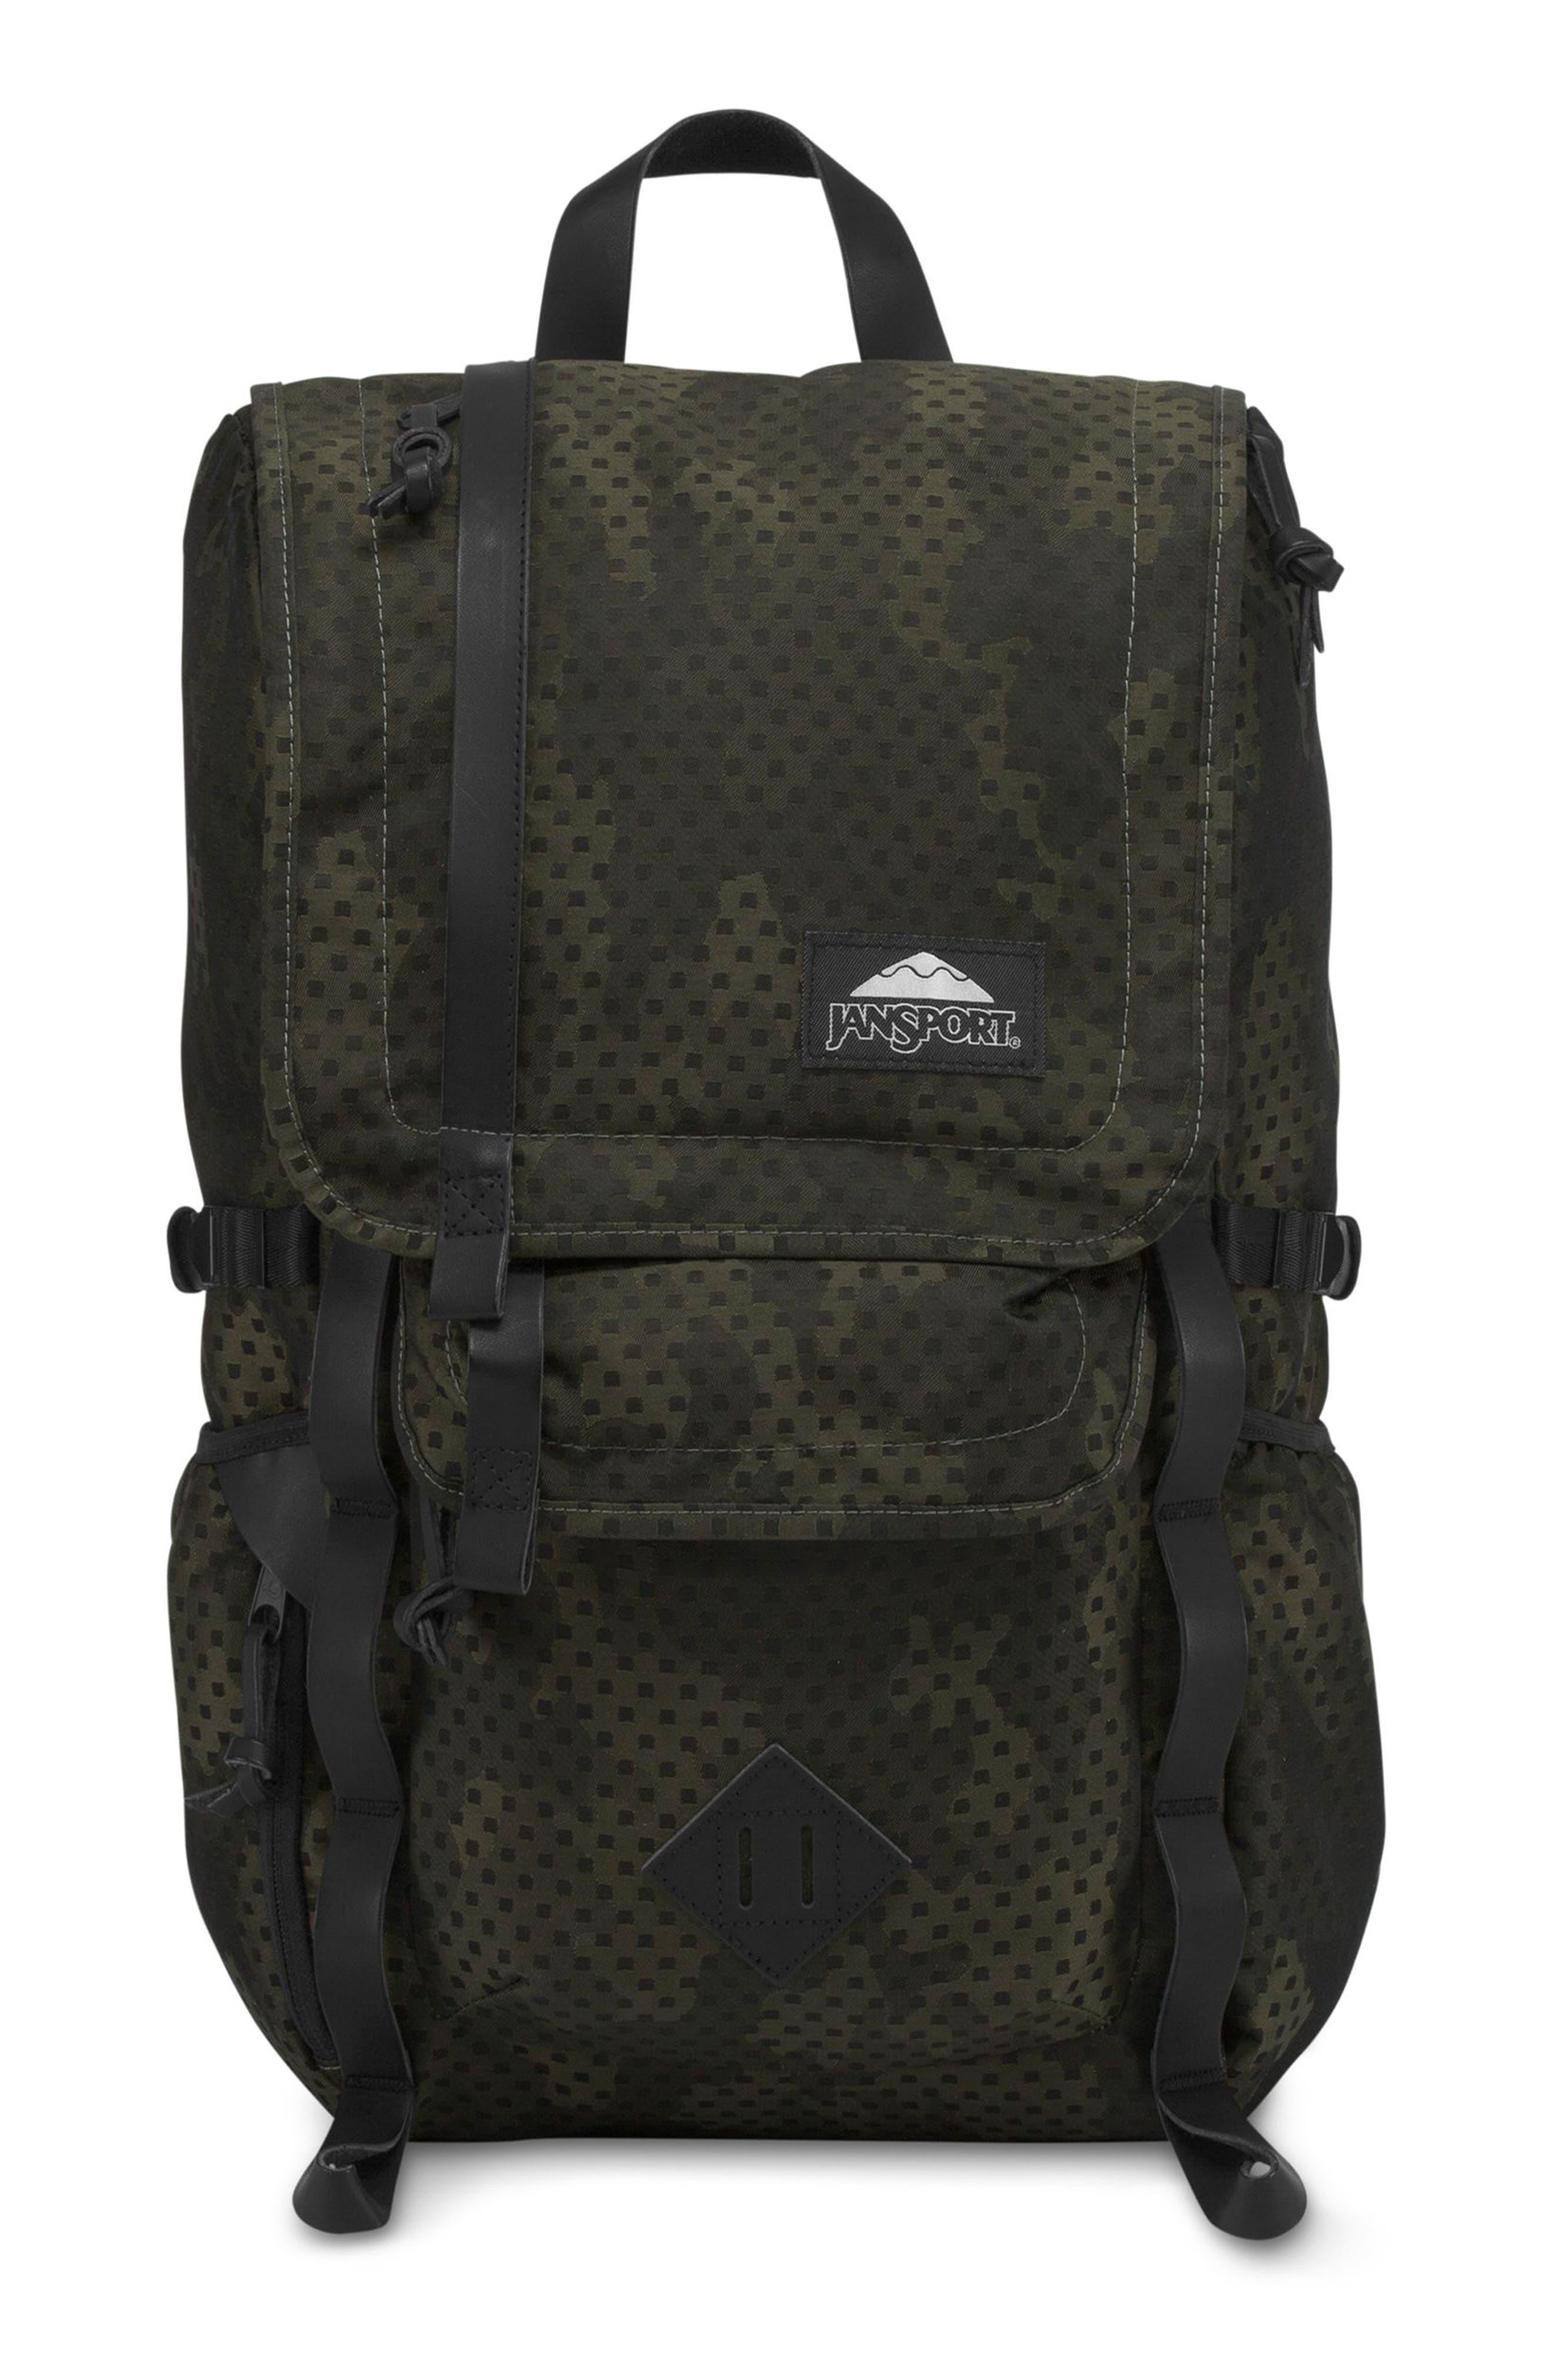 Jansport Wayward Hatchet Backpack